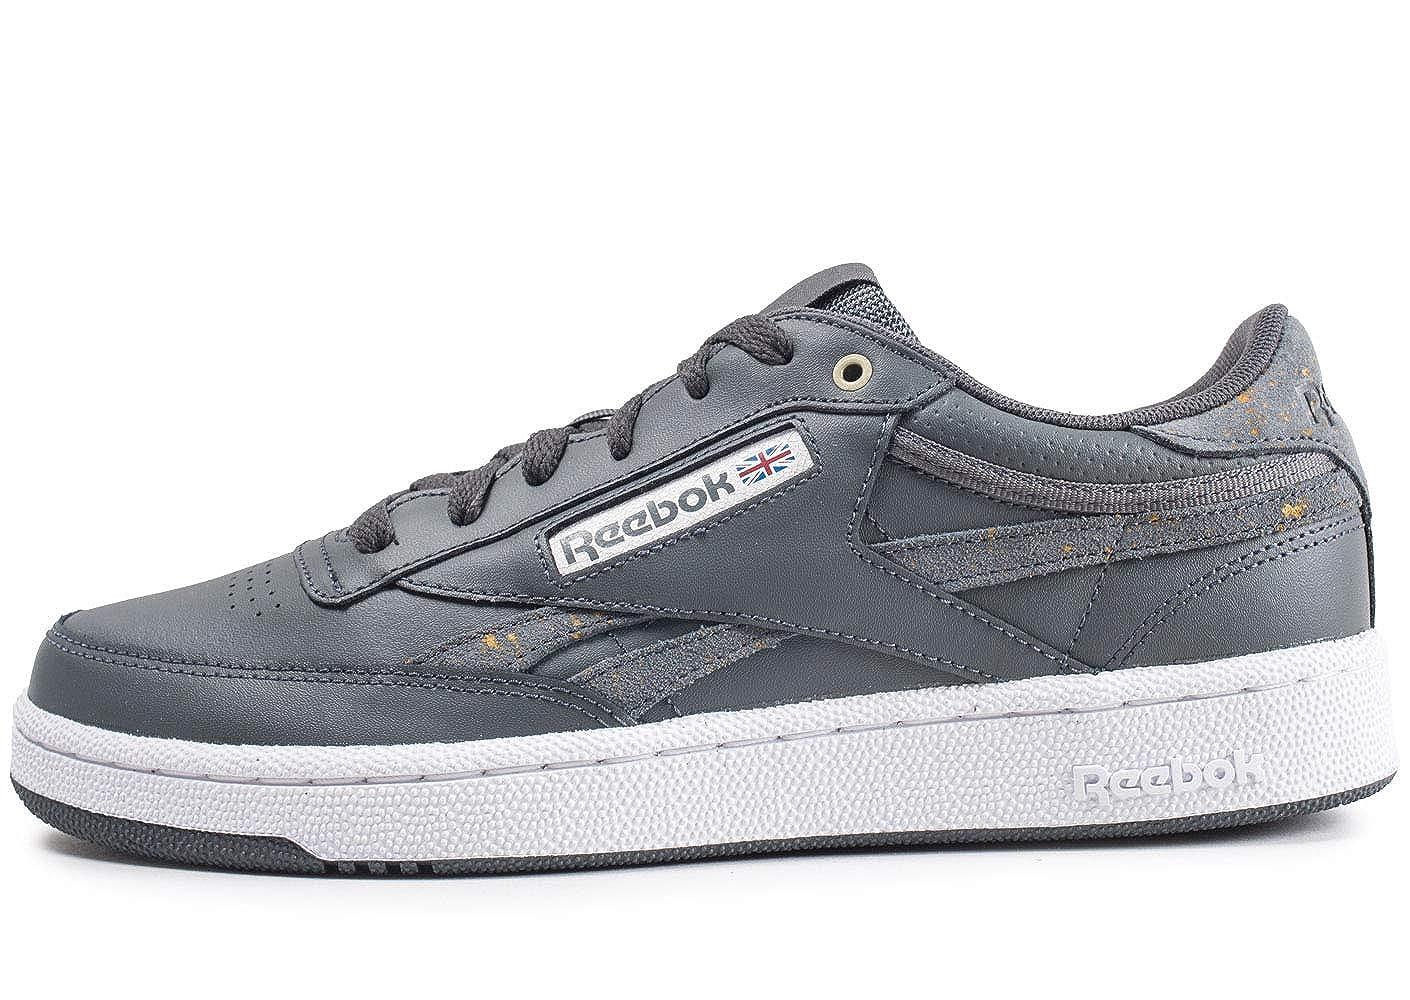 Nike Herren Air Force 1 Ultra Flyknit niedrige Schuhe hell